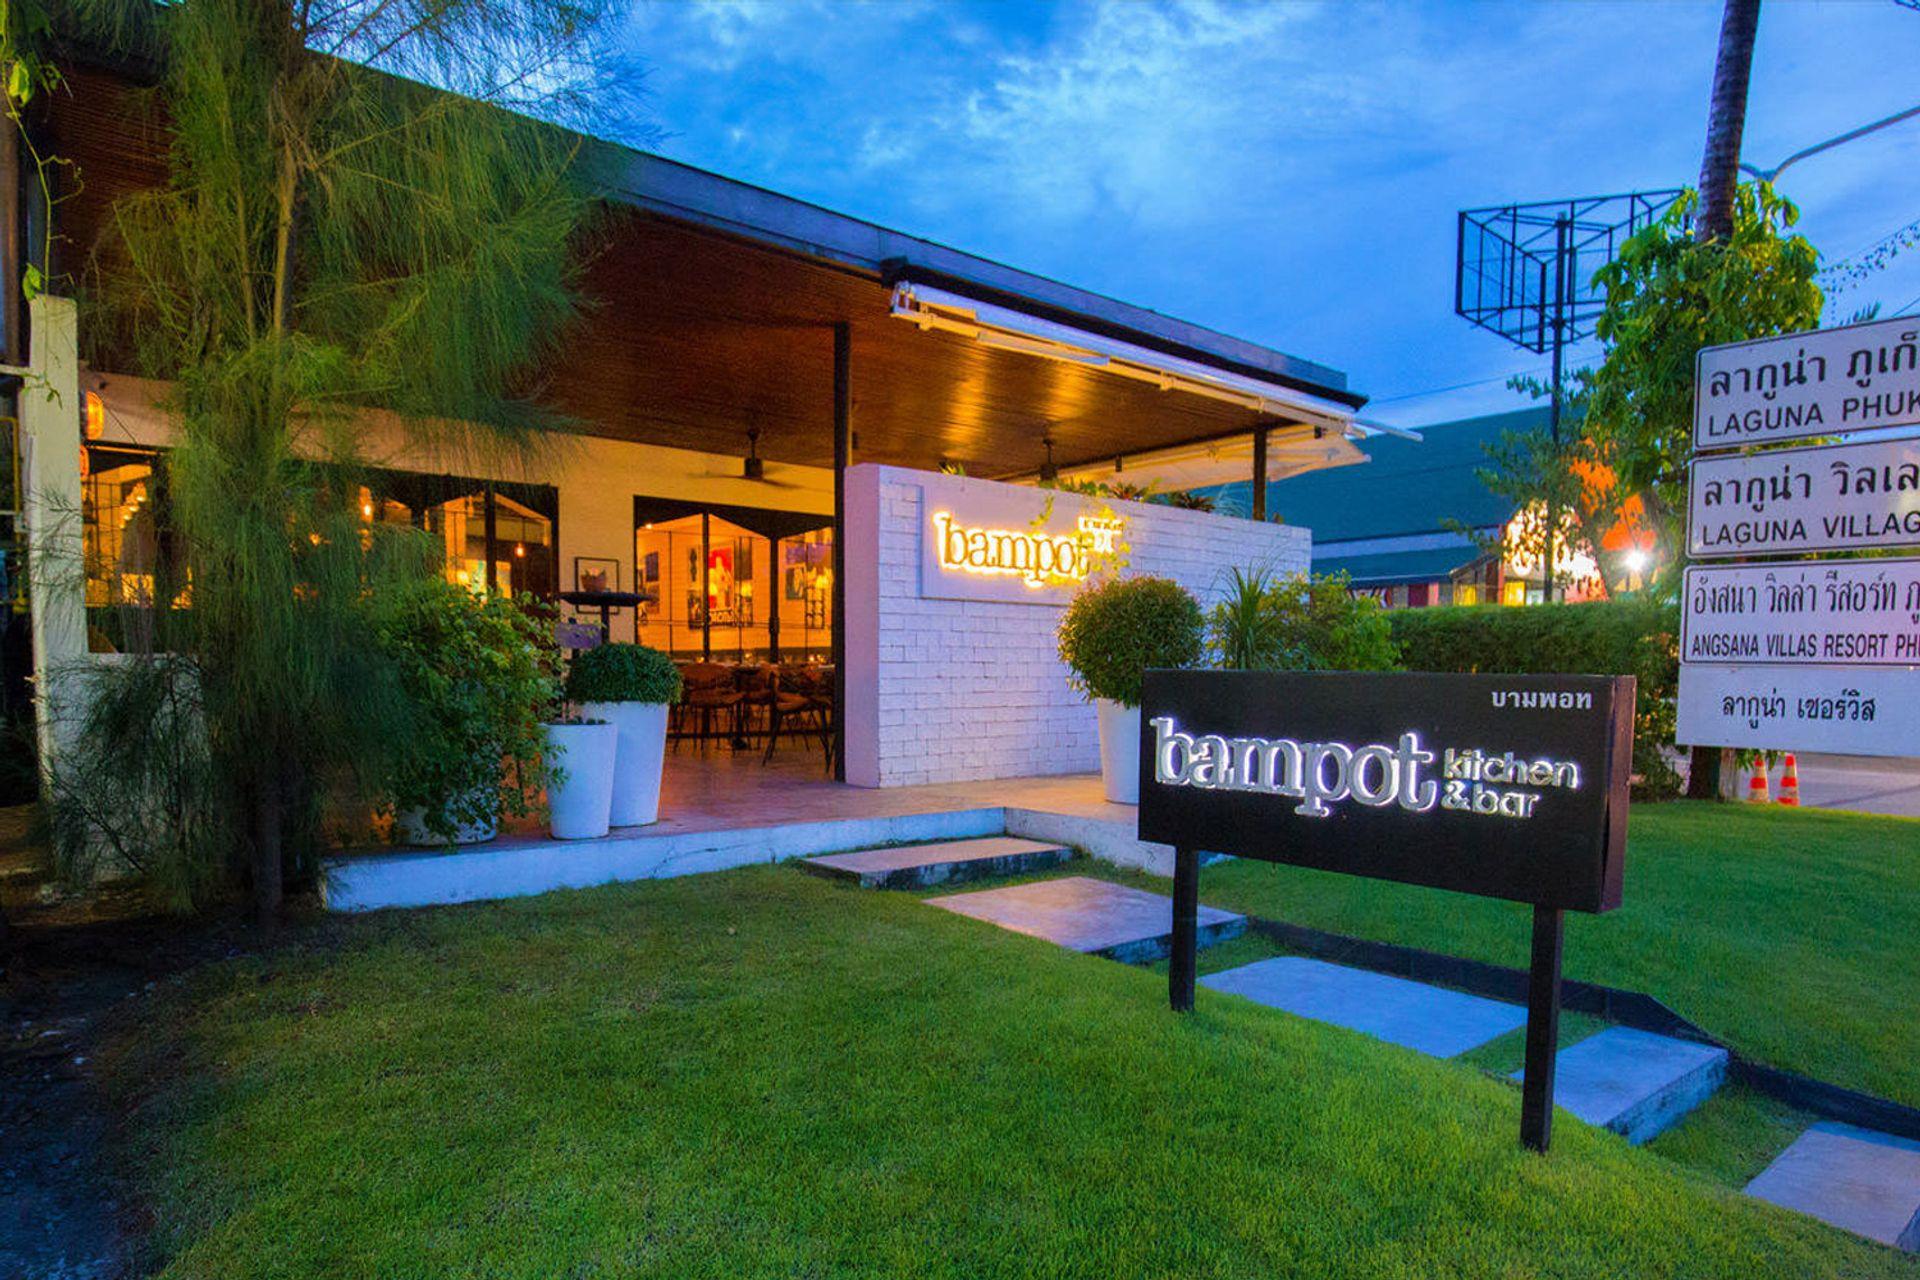 Bampot Kitchen & Bar